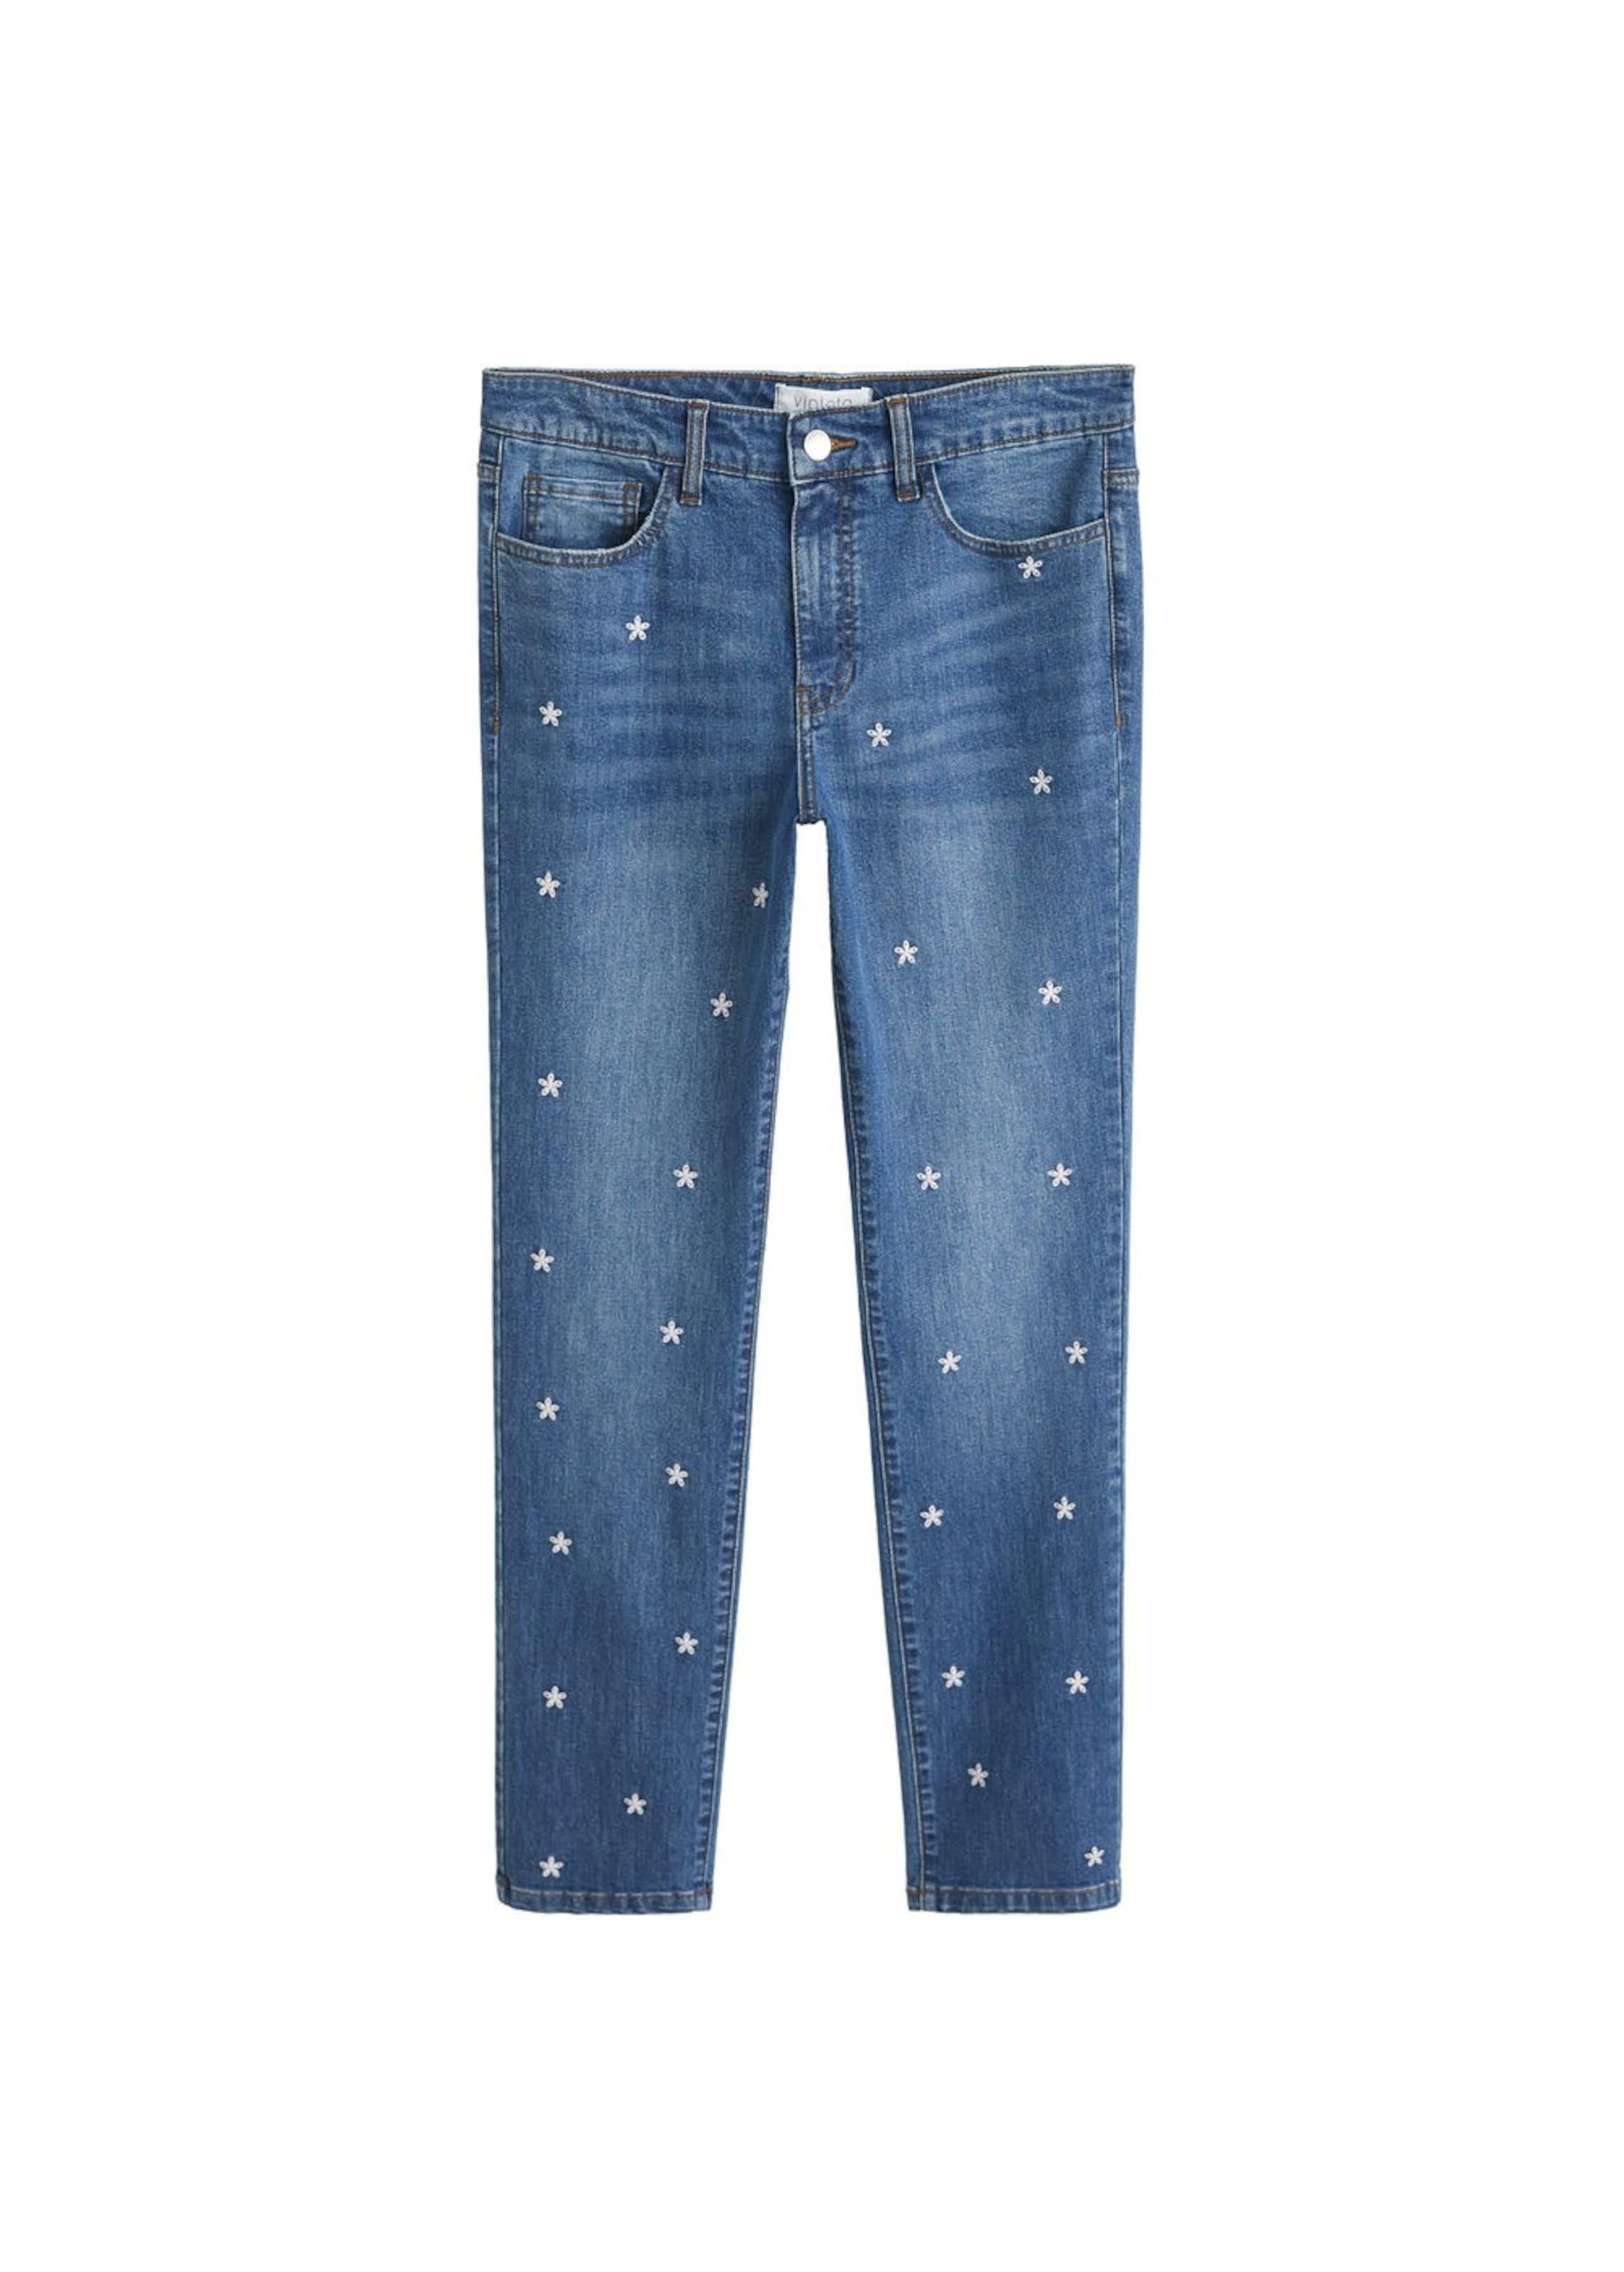 In By Violeta Jeans 'bolitas' Denim Mango Blue OilPkuTwXZ